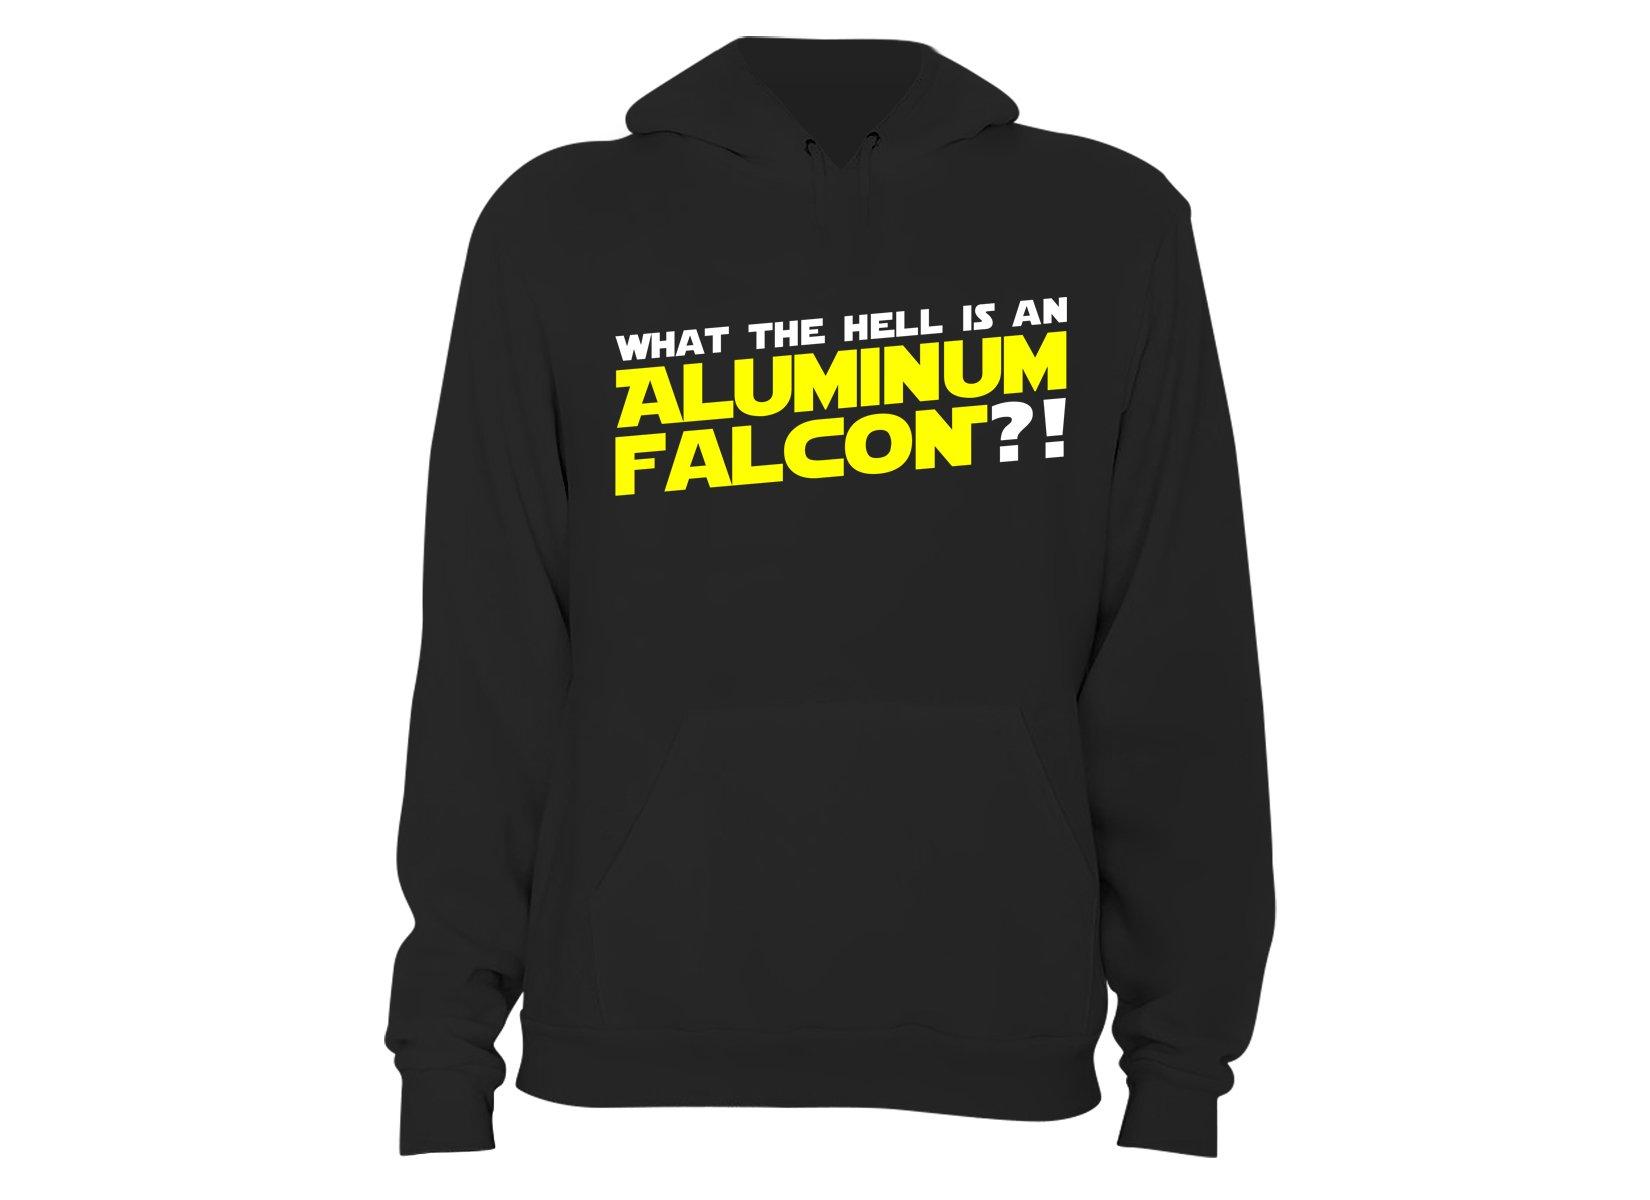 Aluminum Falcon on Hoodie